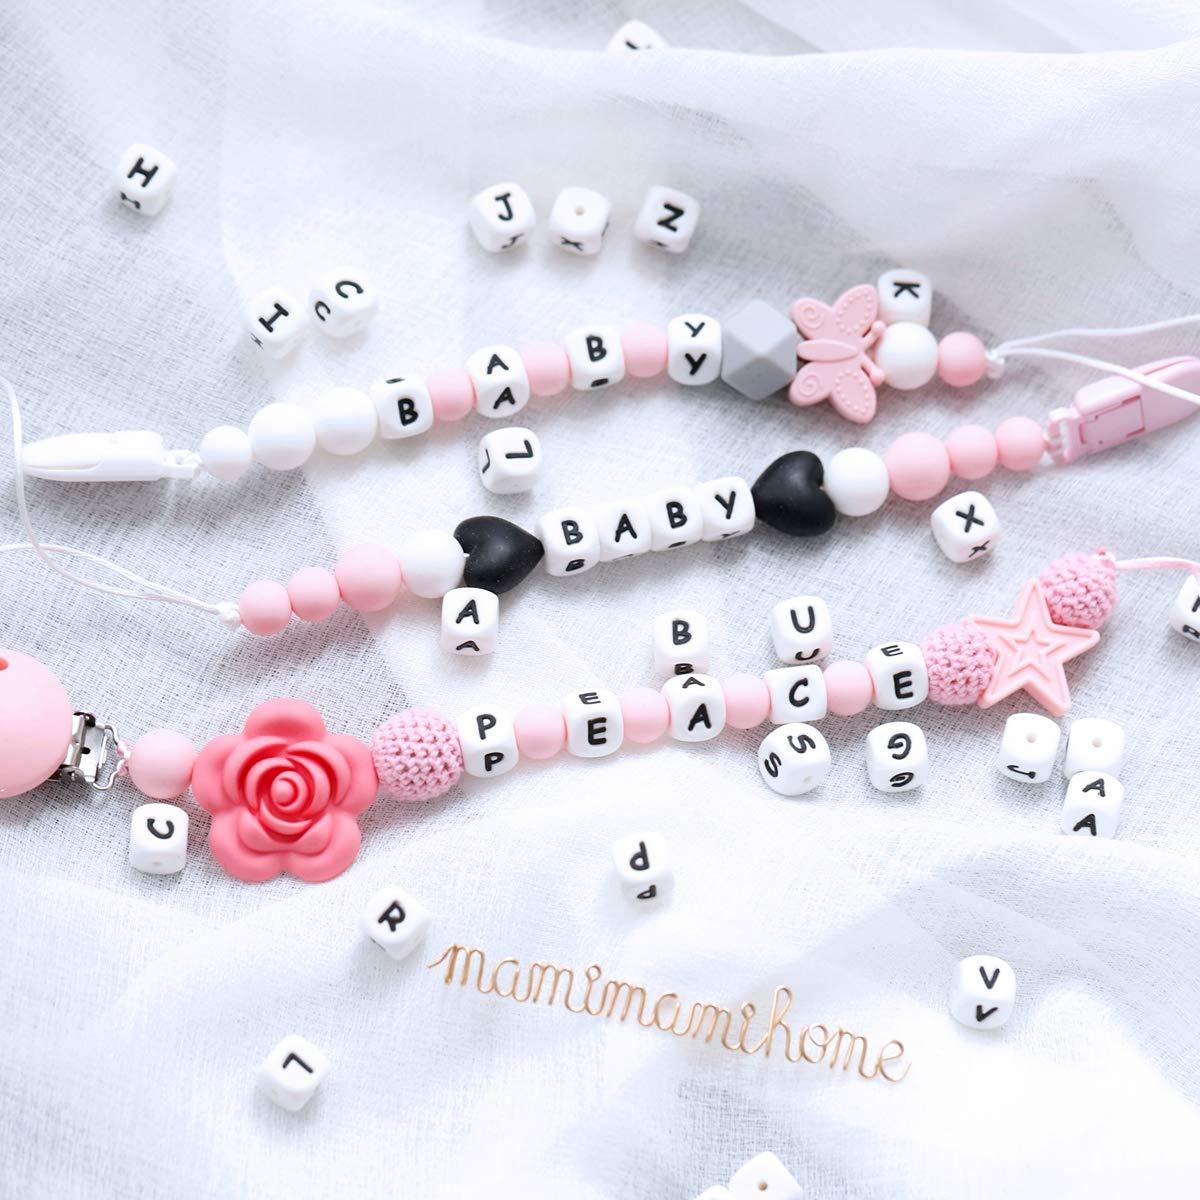 Mamimami Home 26pc Silikon Perlen Baby Teether DIY Halskette Armband Klasse BPA Frei Silikon Kauen Perlen Zahnen Brief Perlen